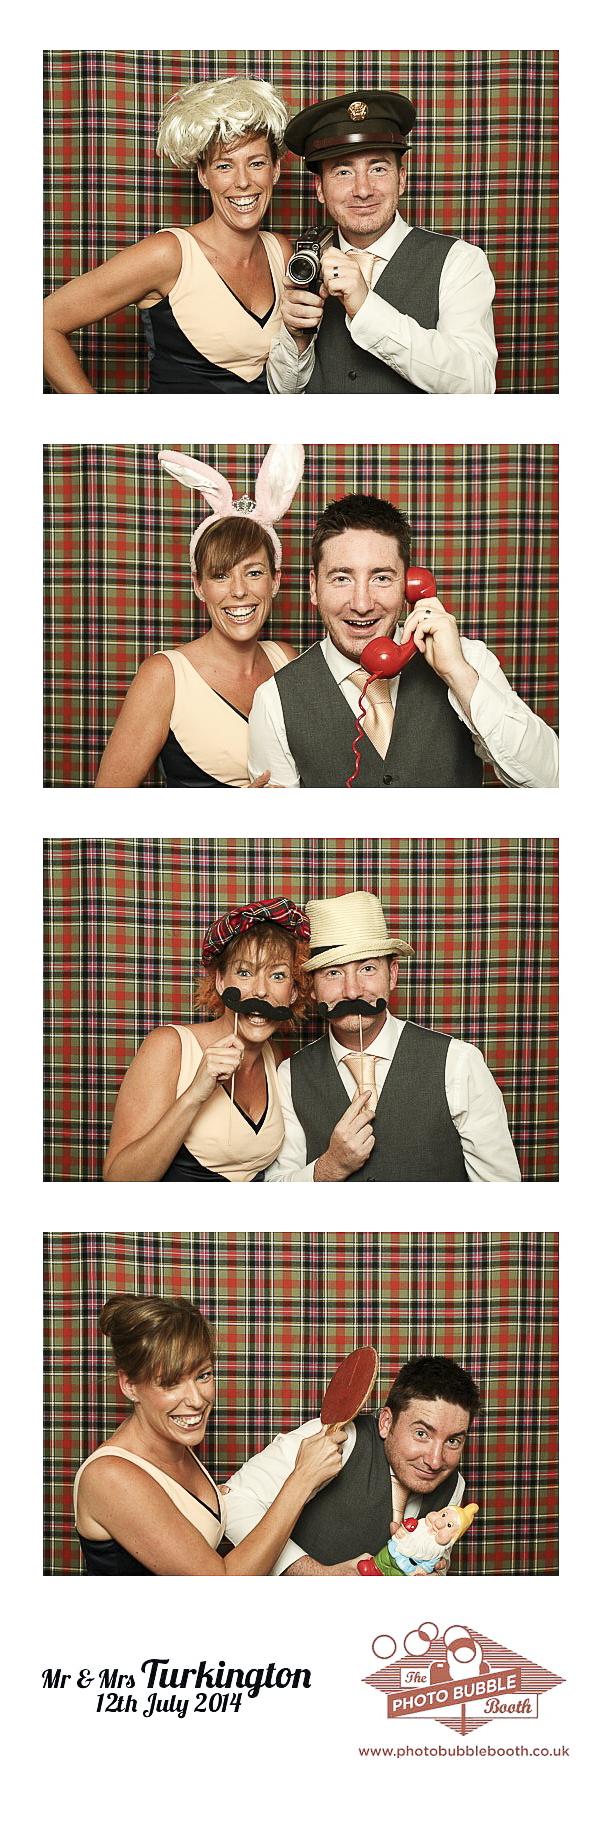 Mr & Mrs Turkington Photobooth _2.JPG